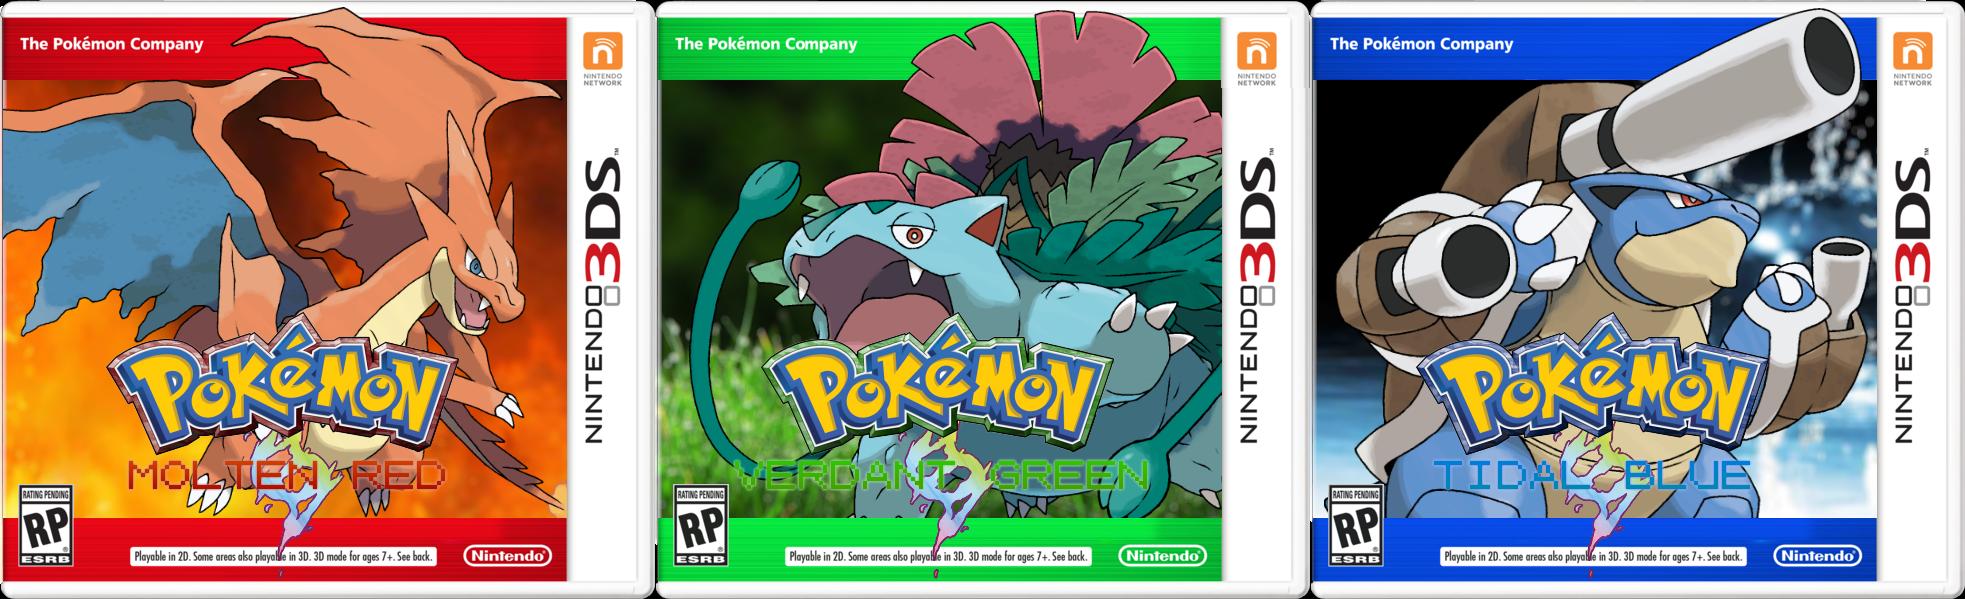 new pokemon game 2019 3ds